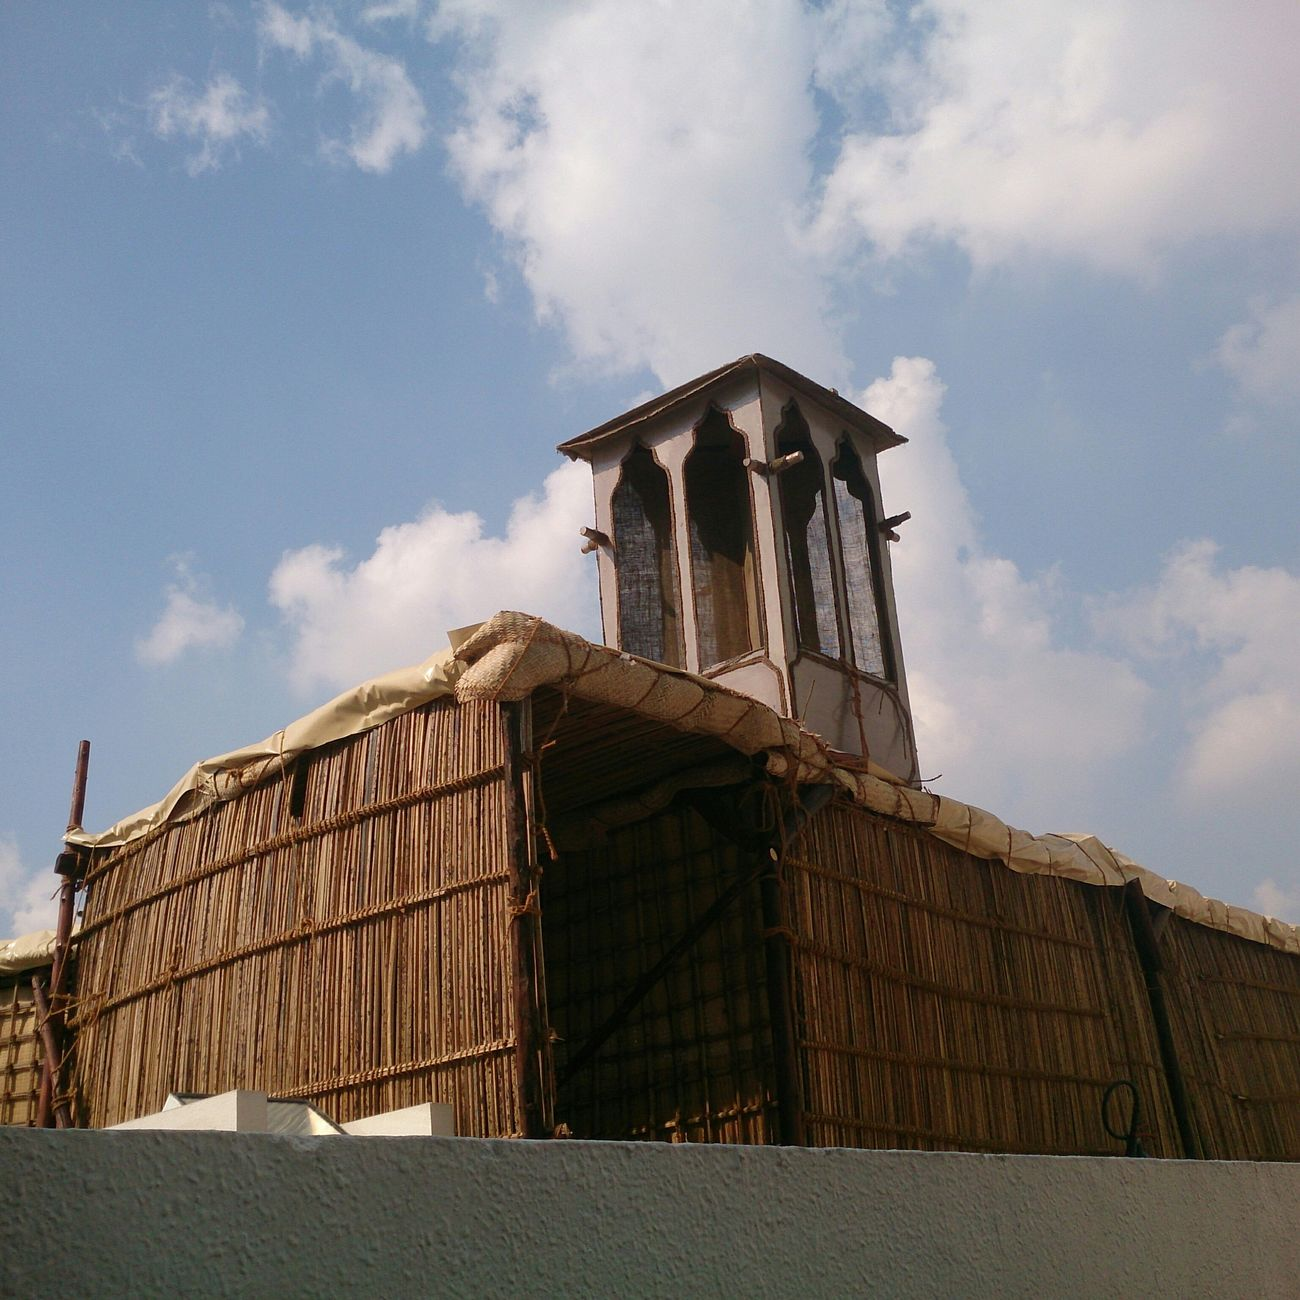 Dubai❤ A View From Dubai Folklore دبي😍😍😍😍 تراث فولكلور برجيل